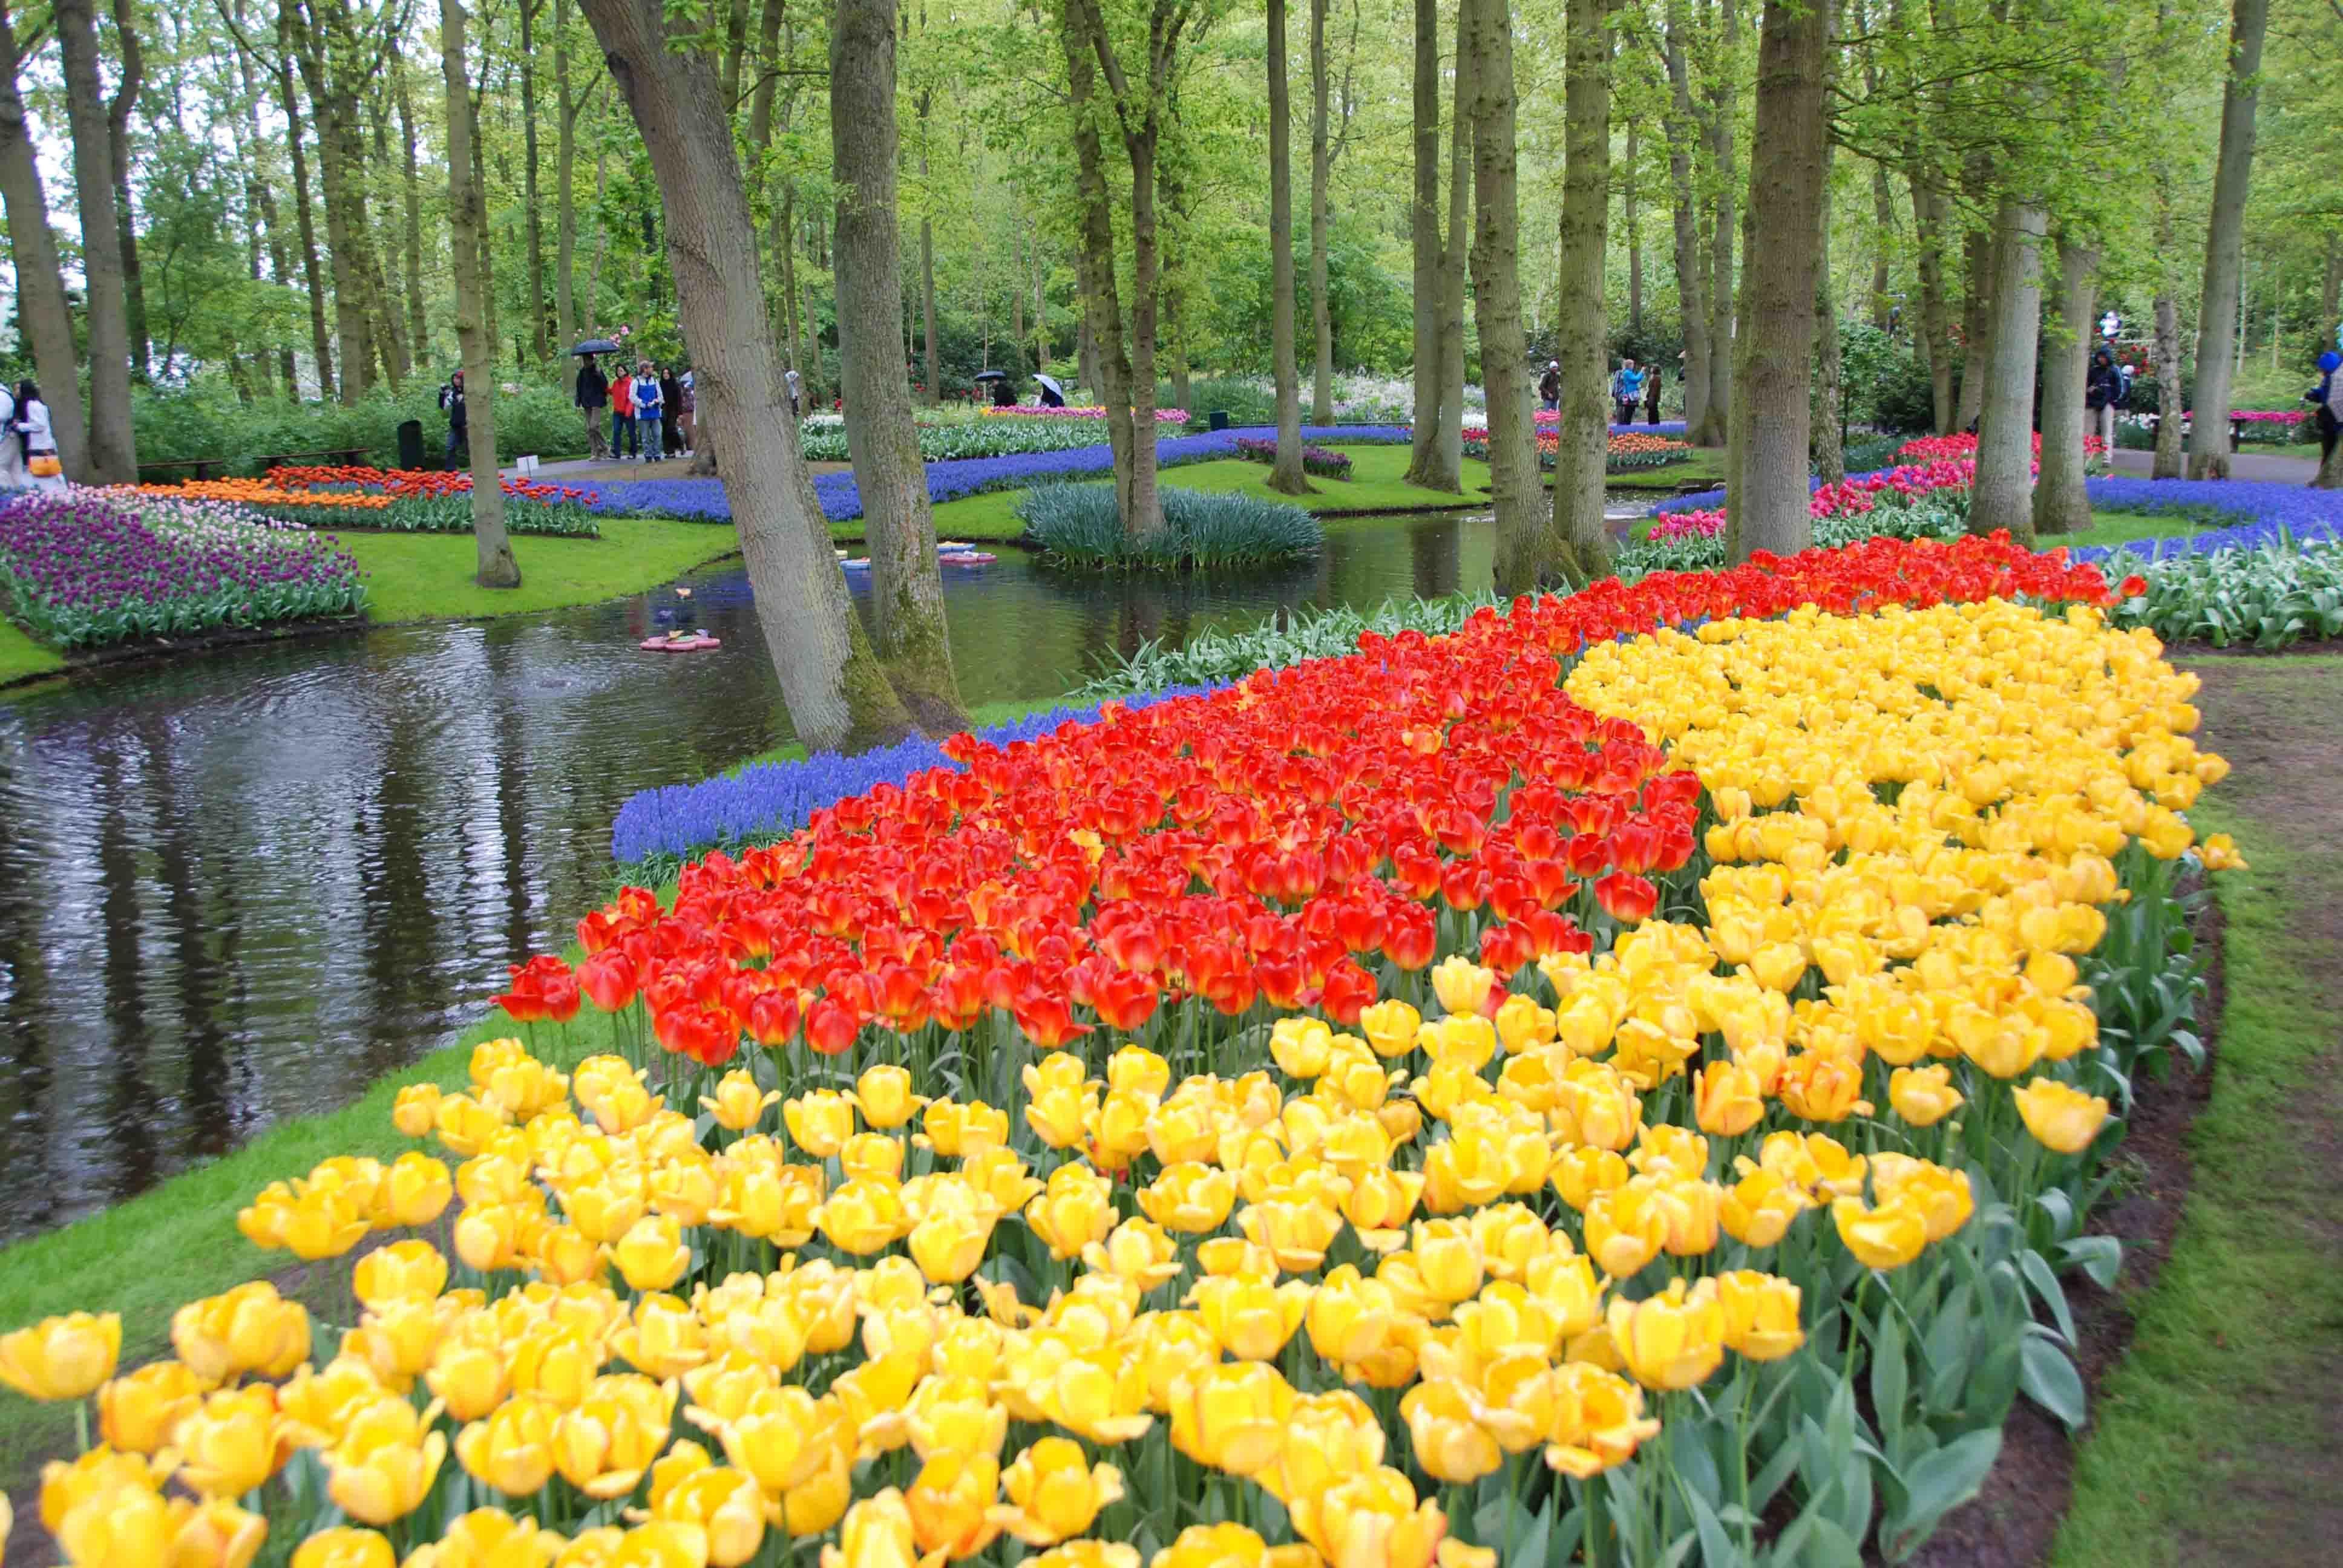 Urban Parks, Lisse, Netherlands, Keukenhof flowers near